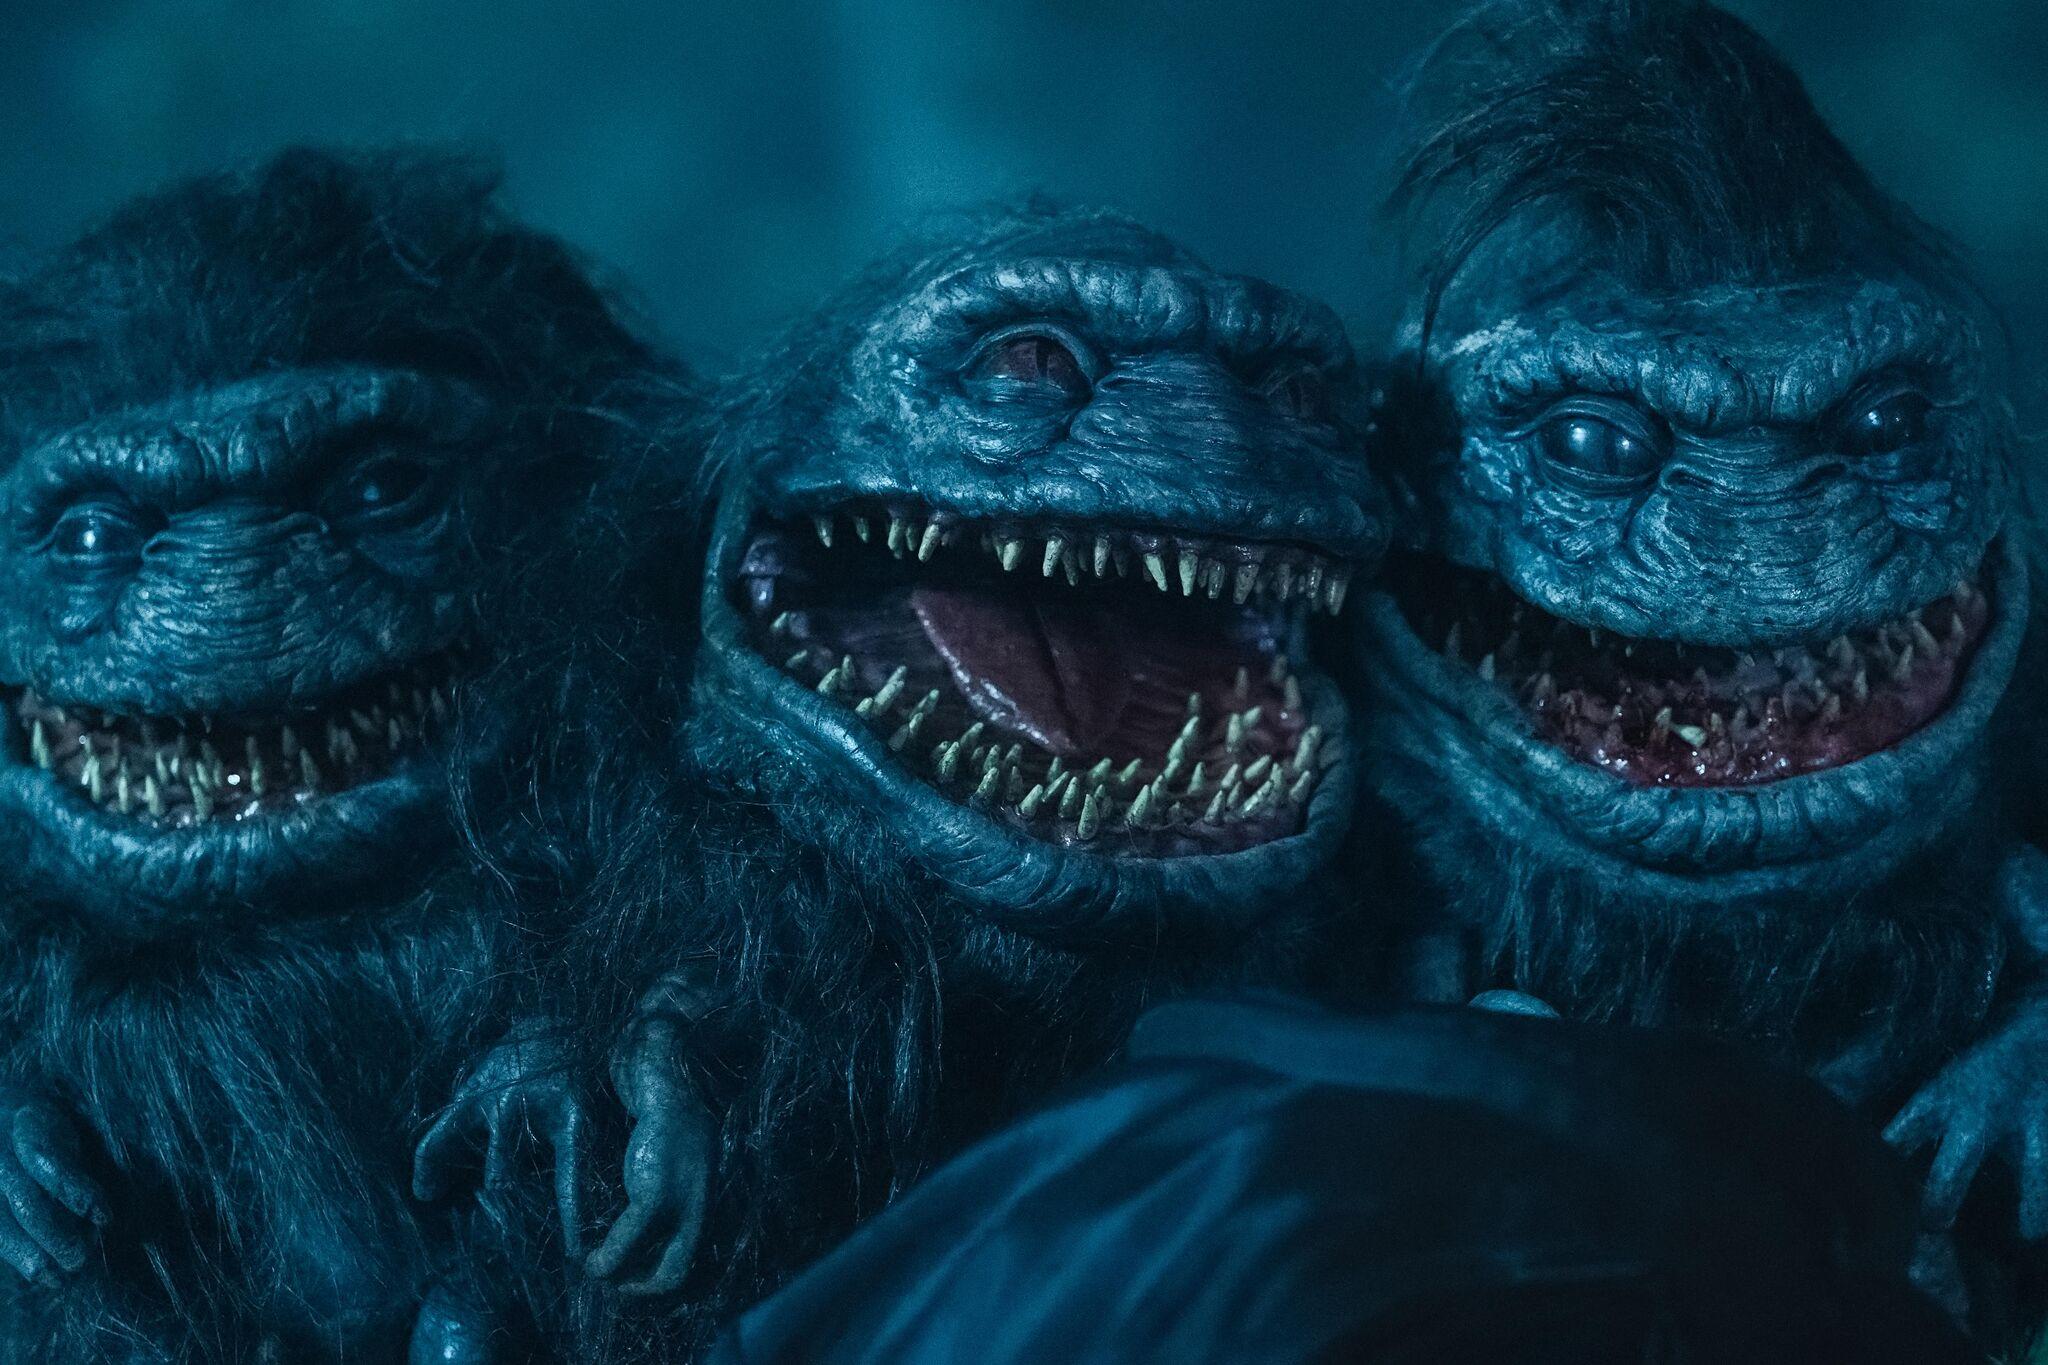 La secuela Critters Attack! tendrá premiere mundial en Fantasia Fest de Montreal